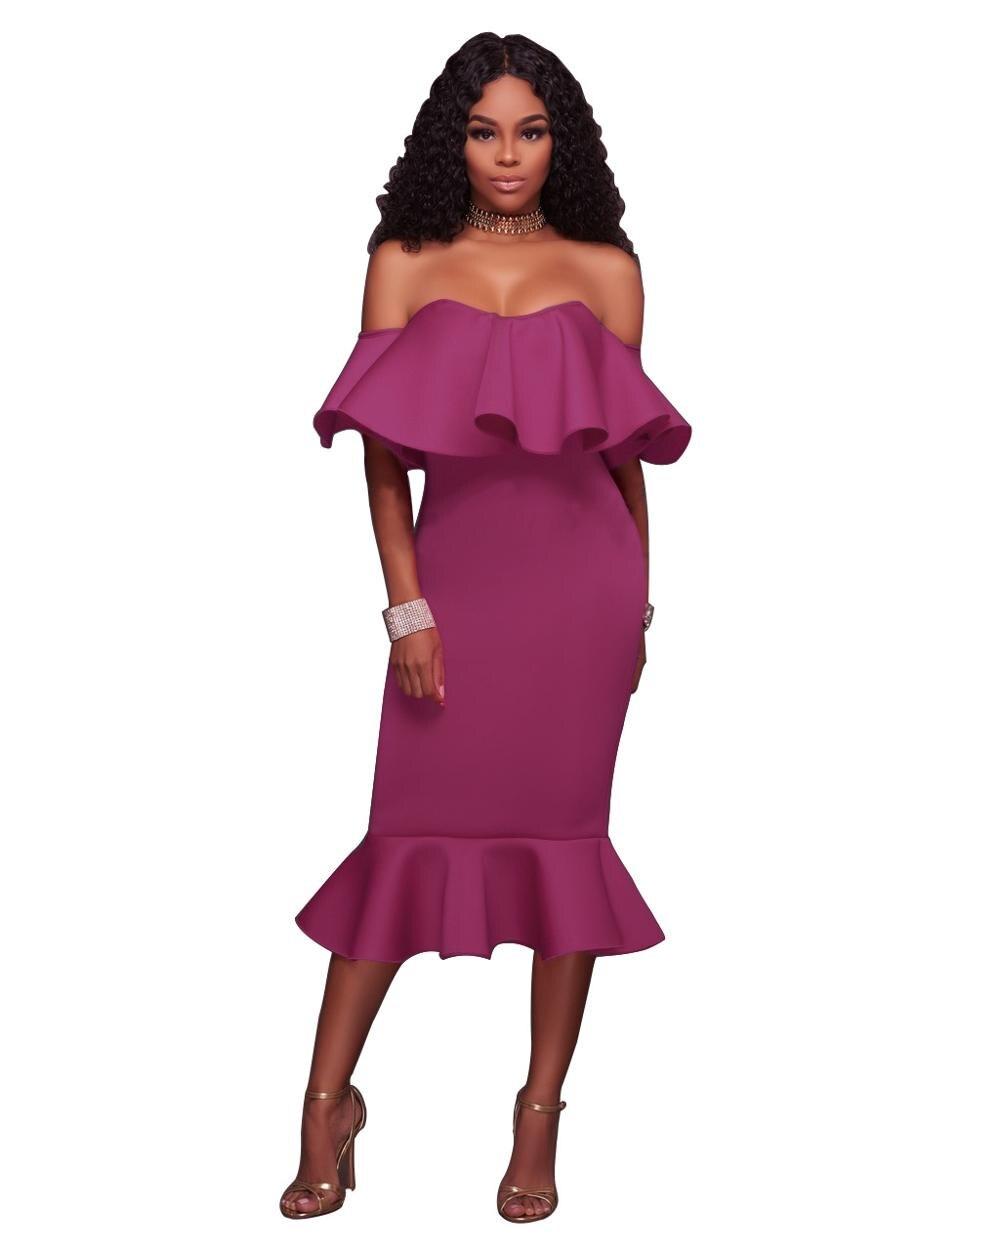 30b43ba4a6 US $9.35 20% OFF Sexy Off Shoulder Ruffle Midi Dress 2019 New Women Sexy  Slim Pencil Bodycon Mermaid Party Dress White Black Pink Dress Vestidos-in  ...